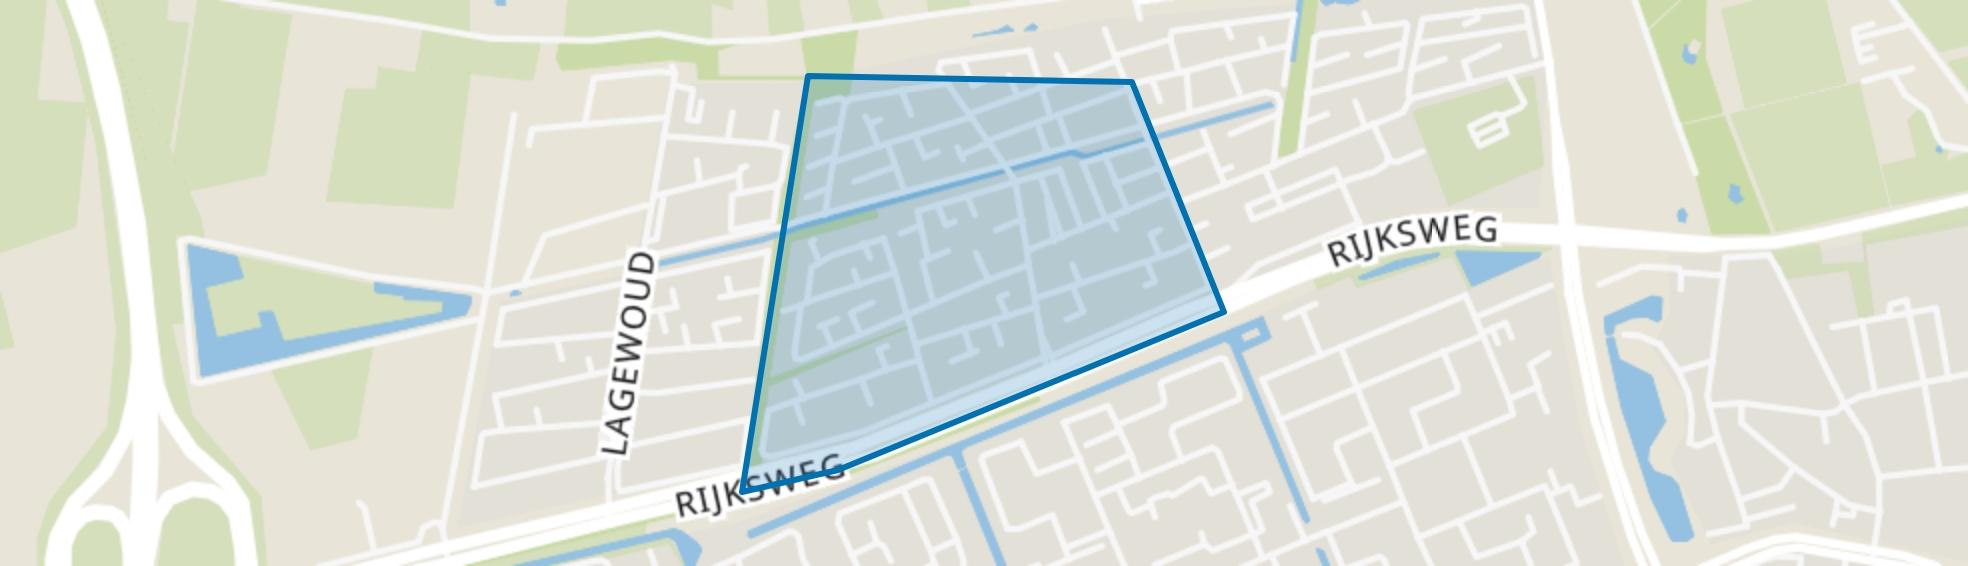 De Bossen, Ede map